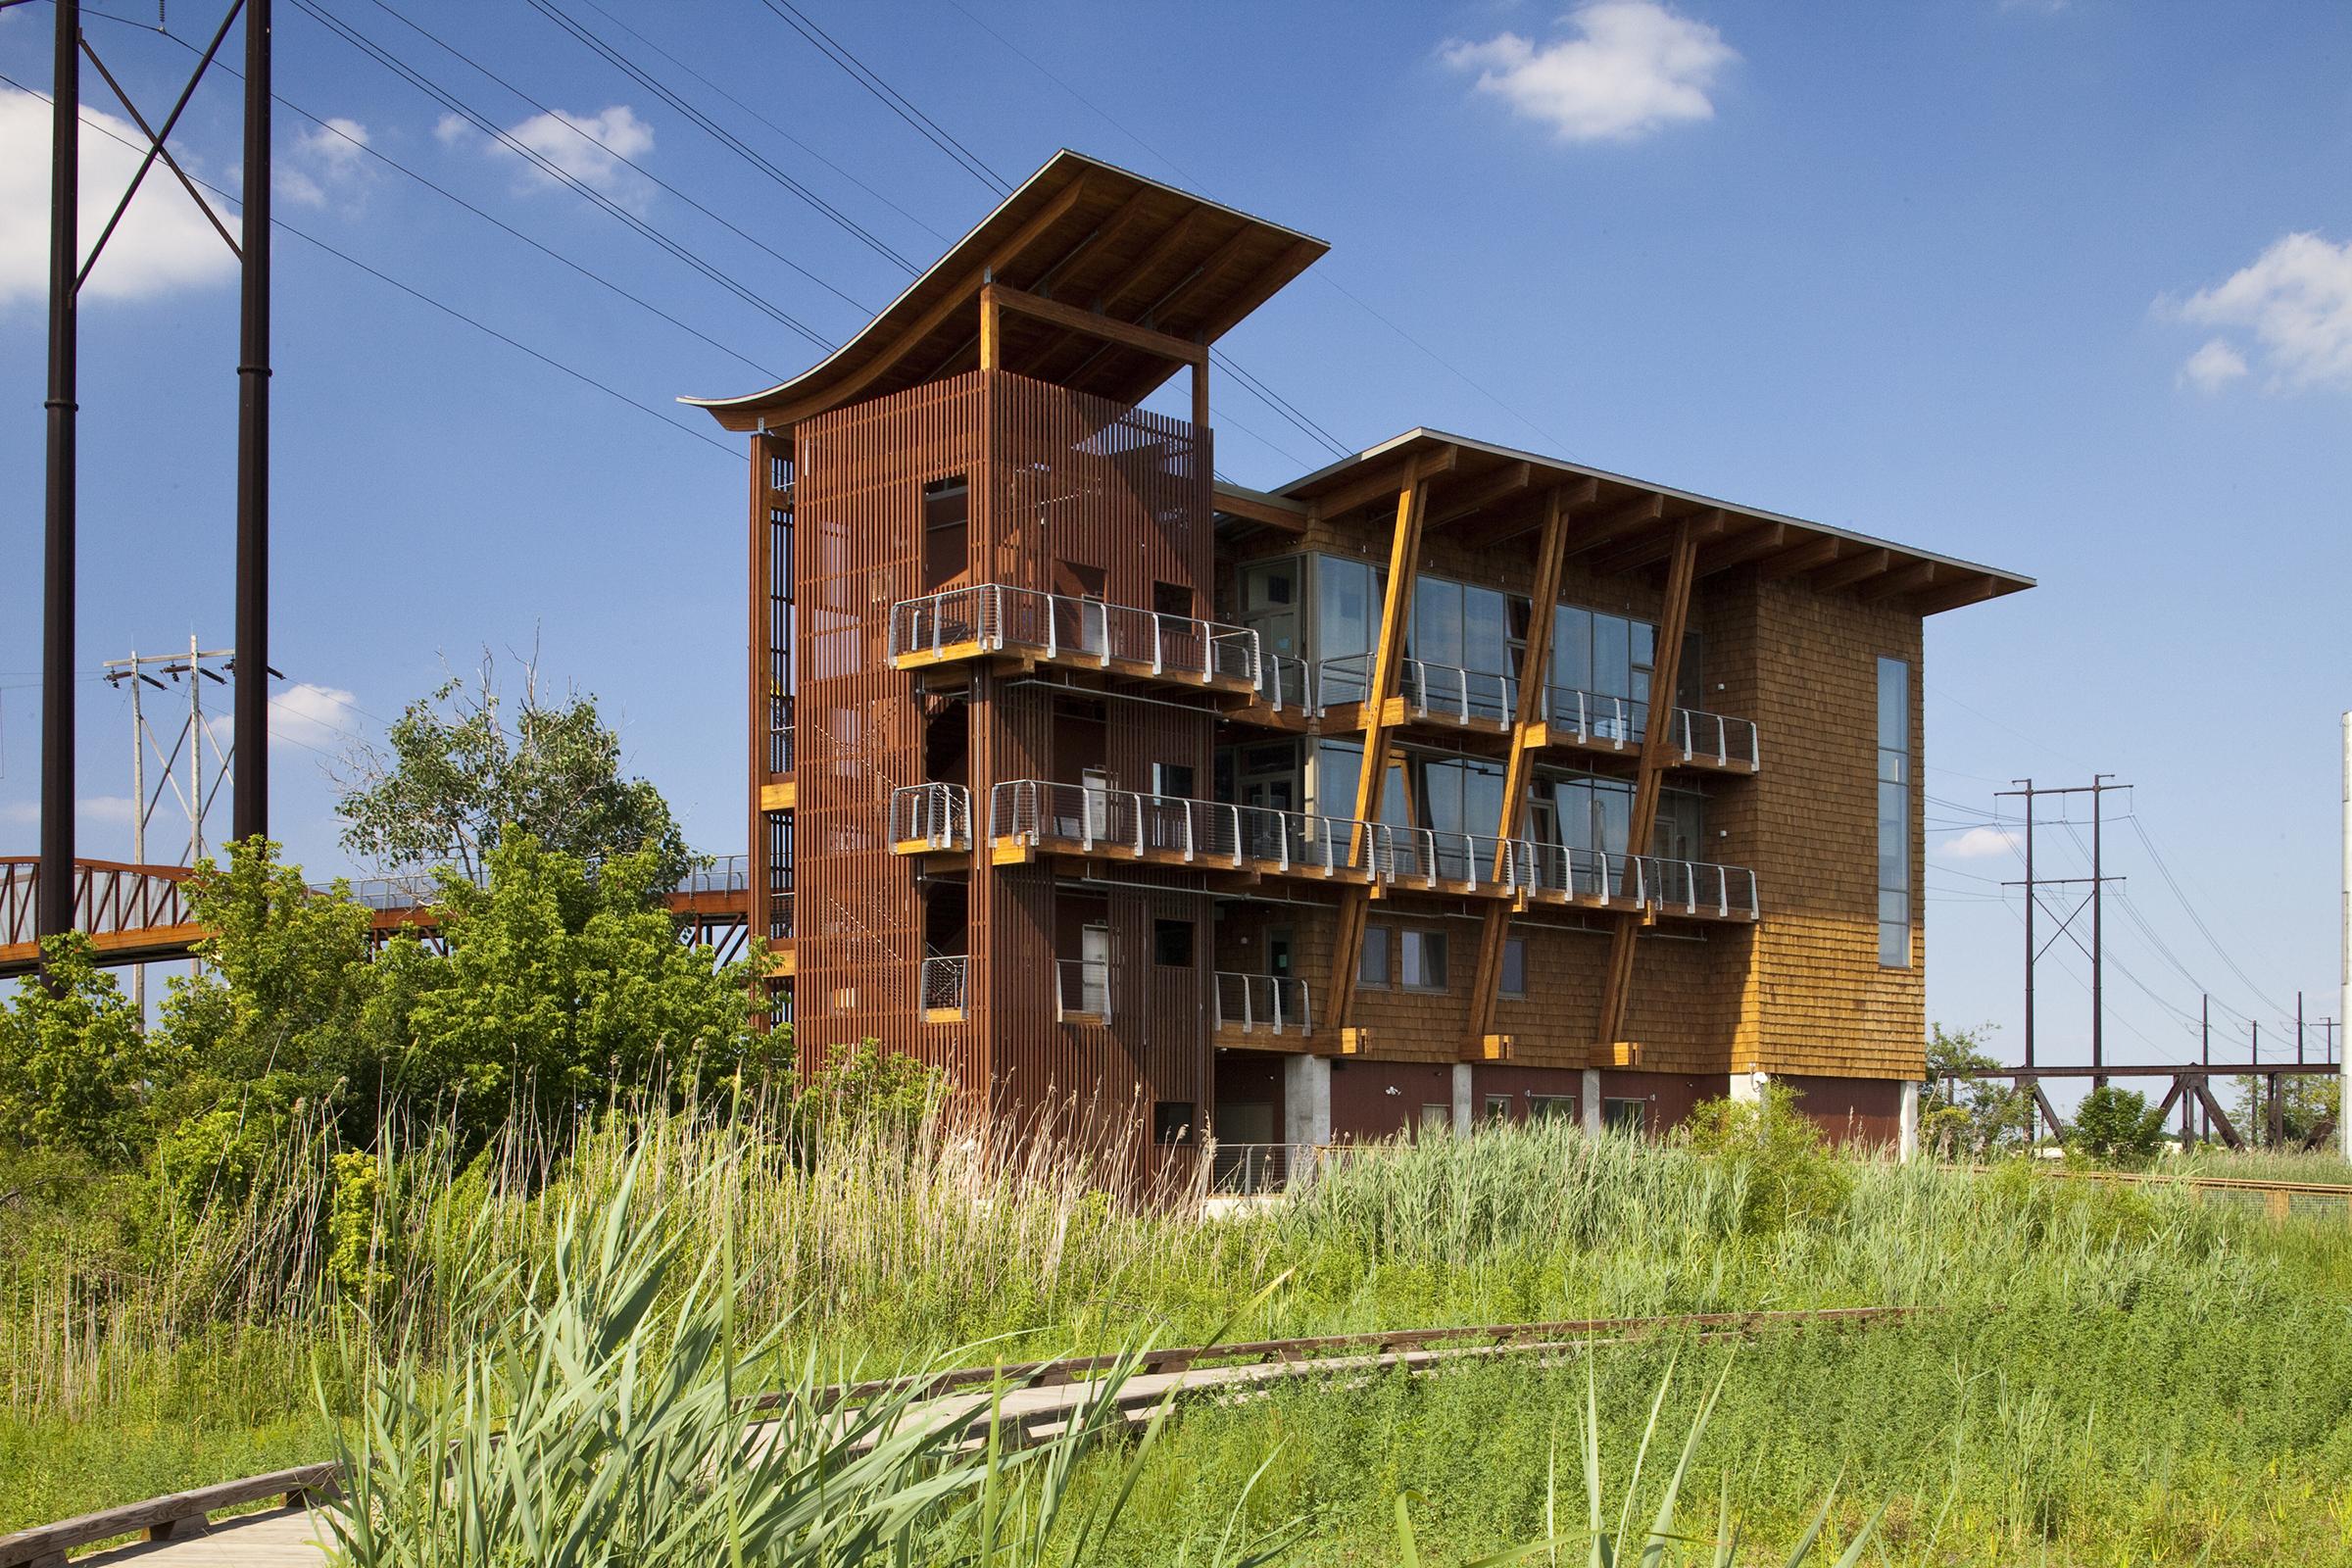 Dupont environmental education center architect magazine for Architects corporation